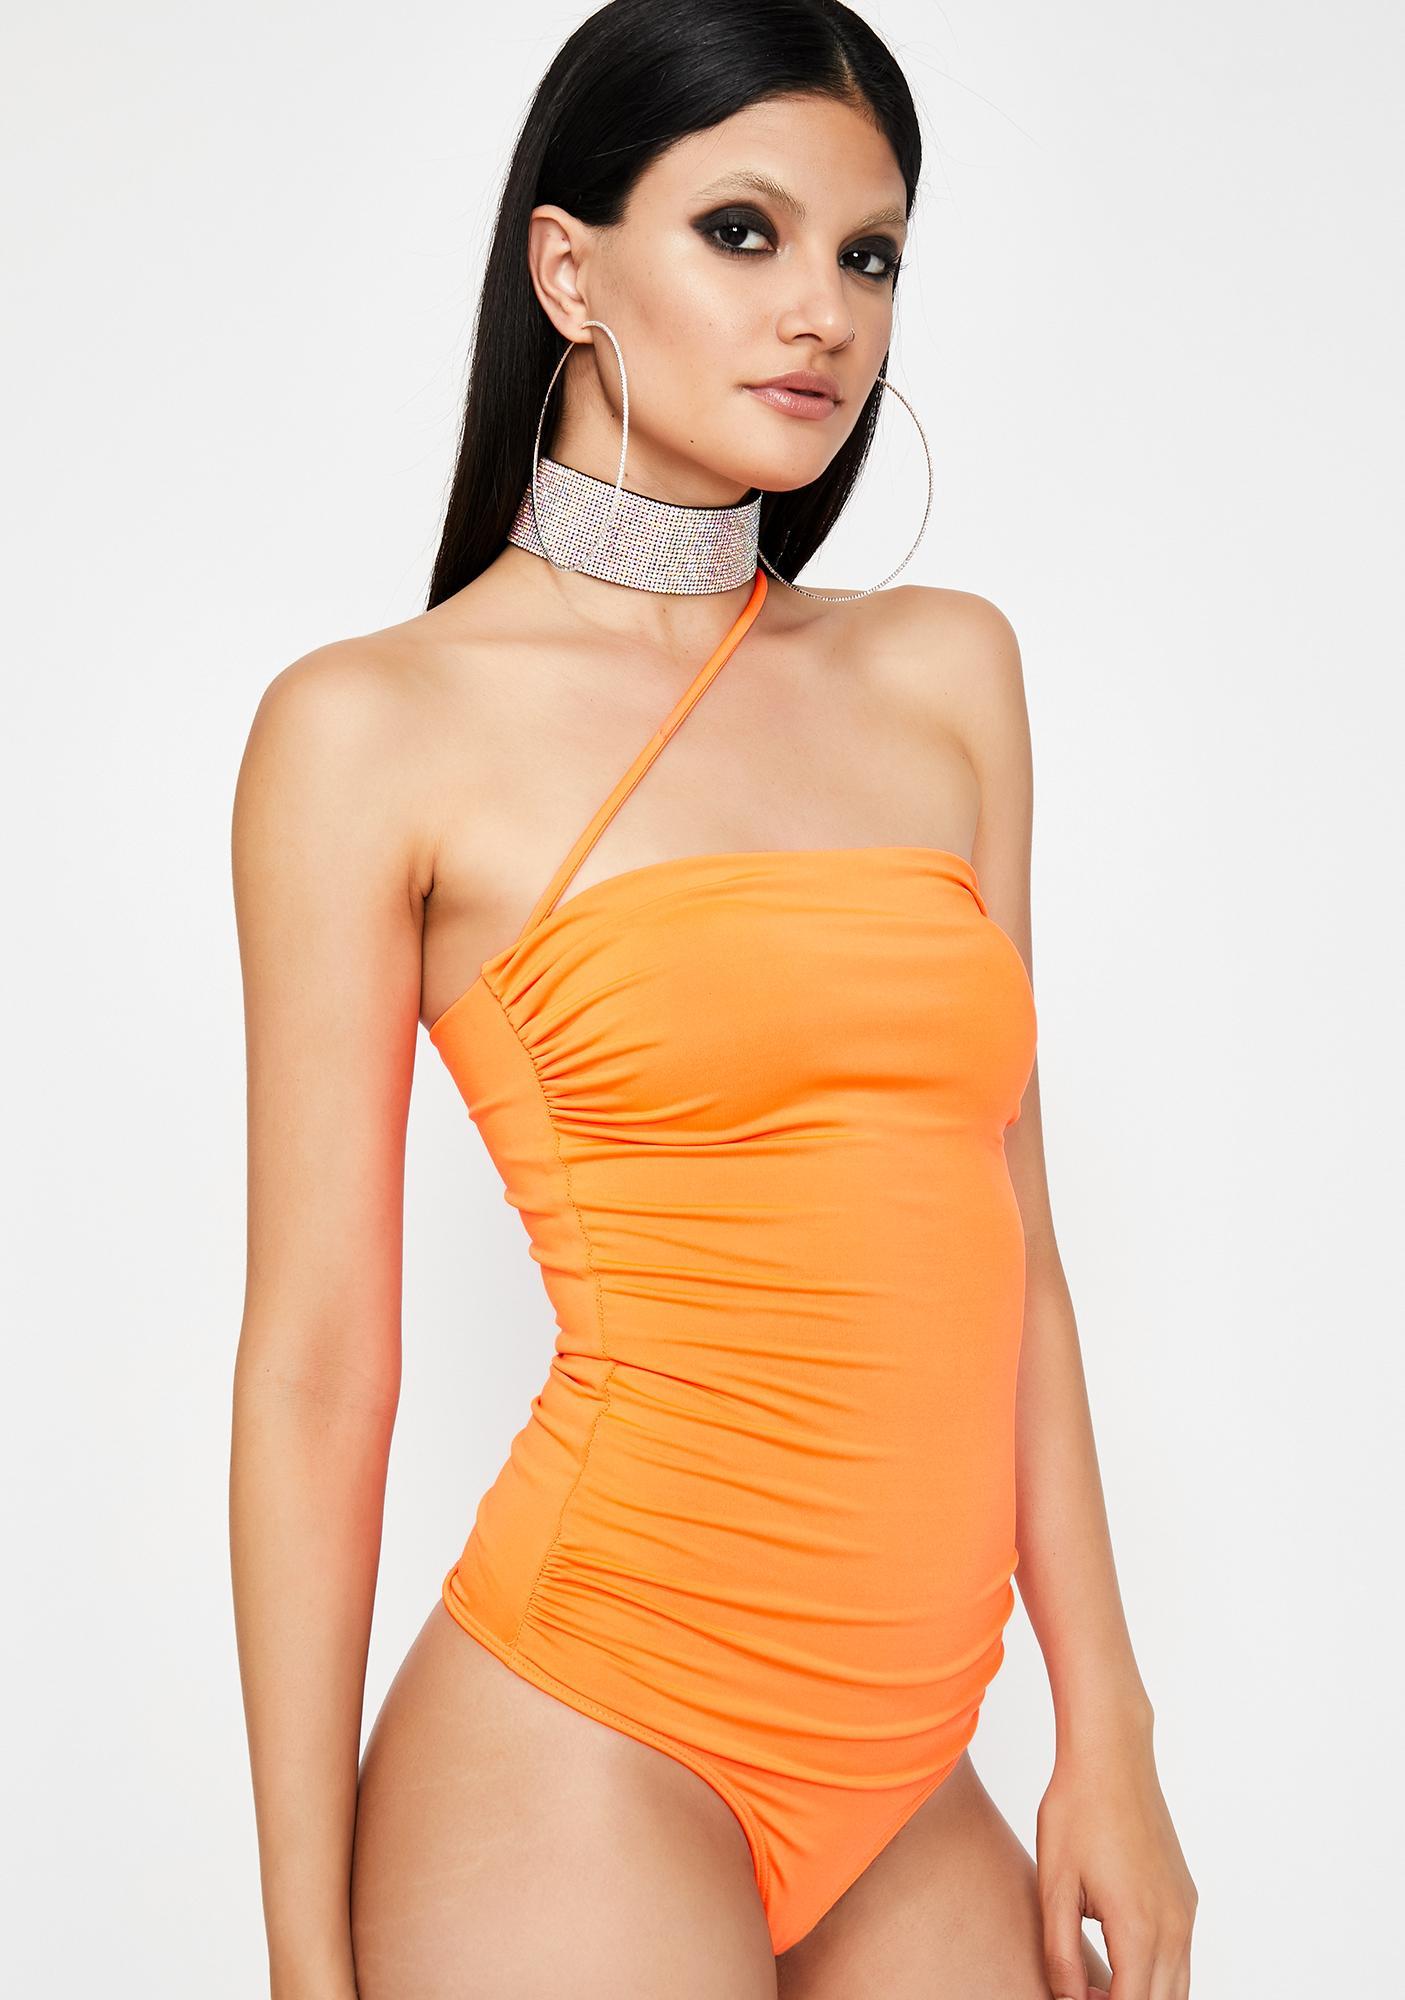 Juicy Slay Talent Ruched Bodysuit